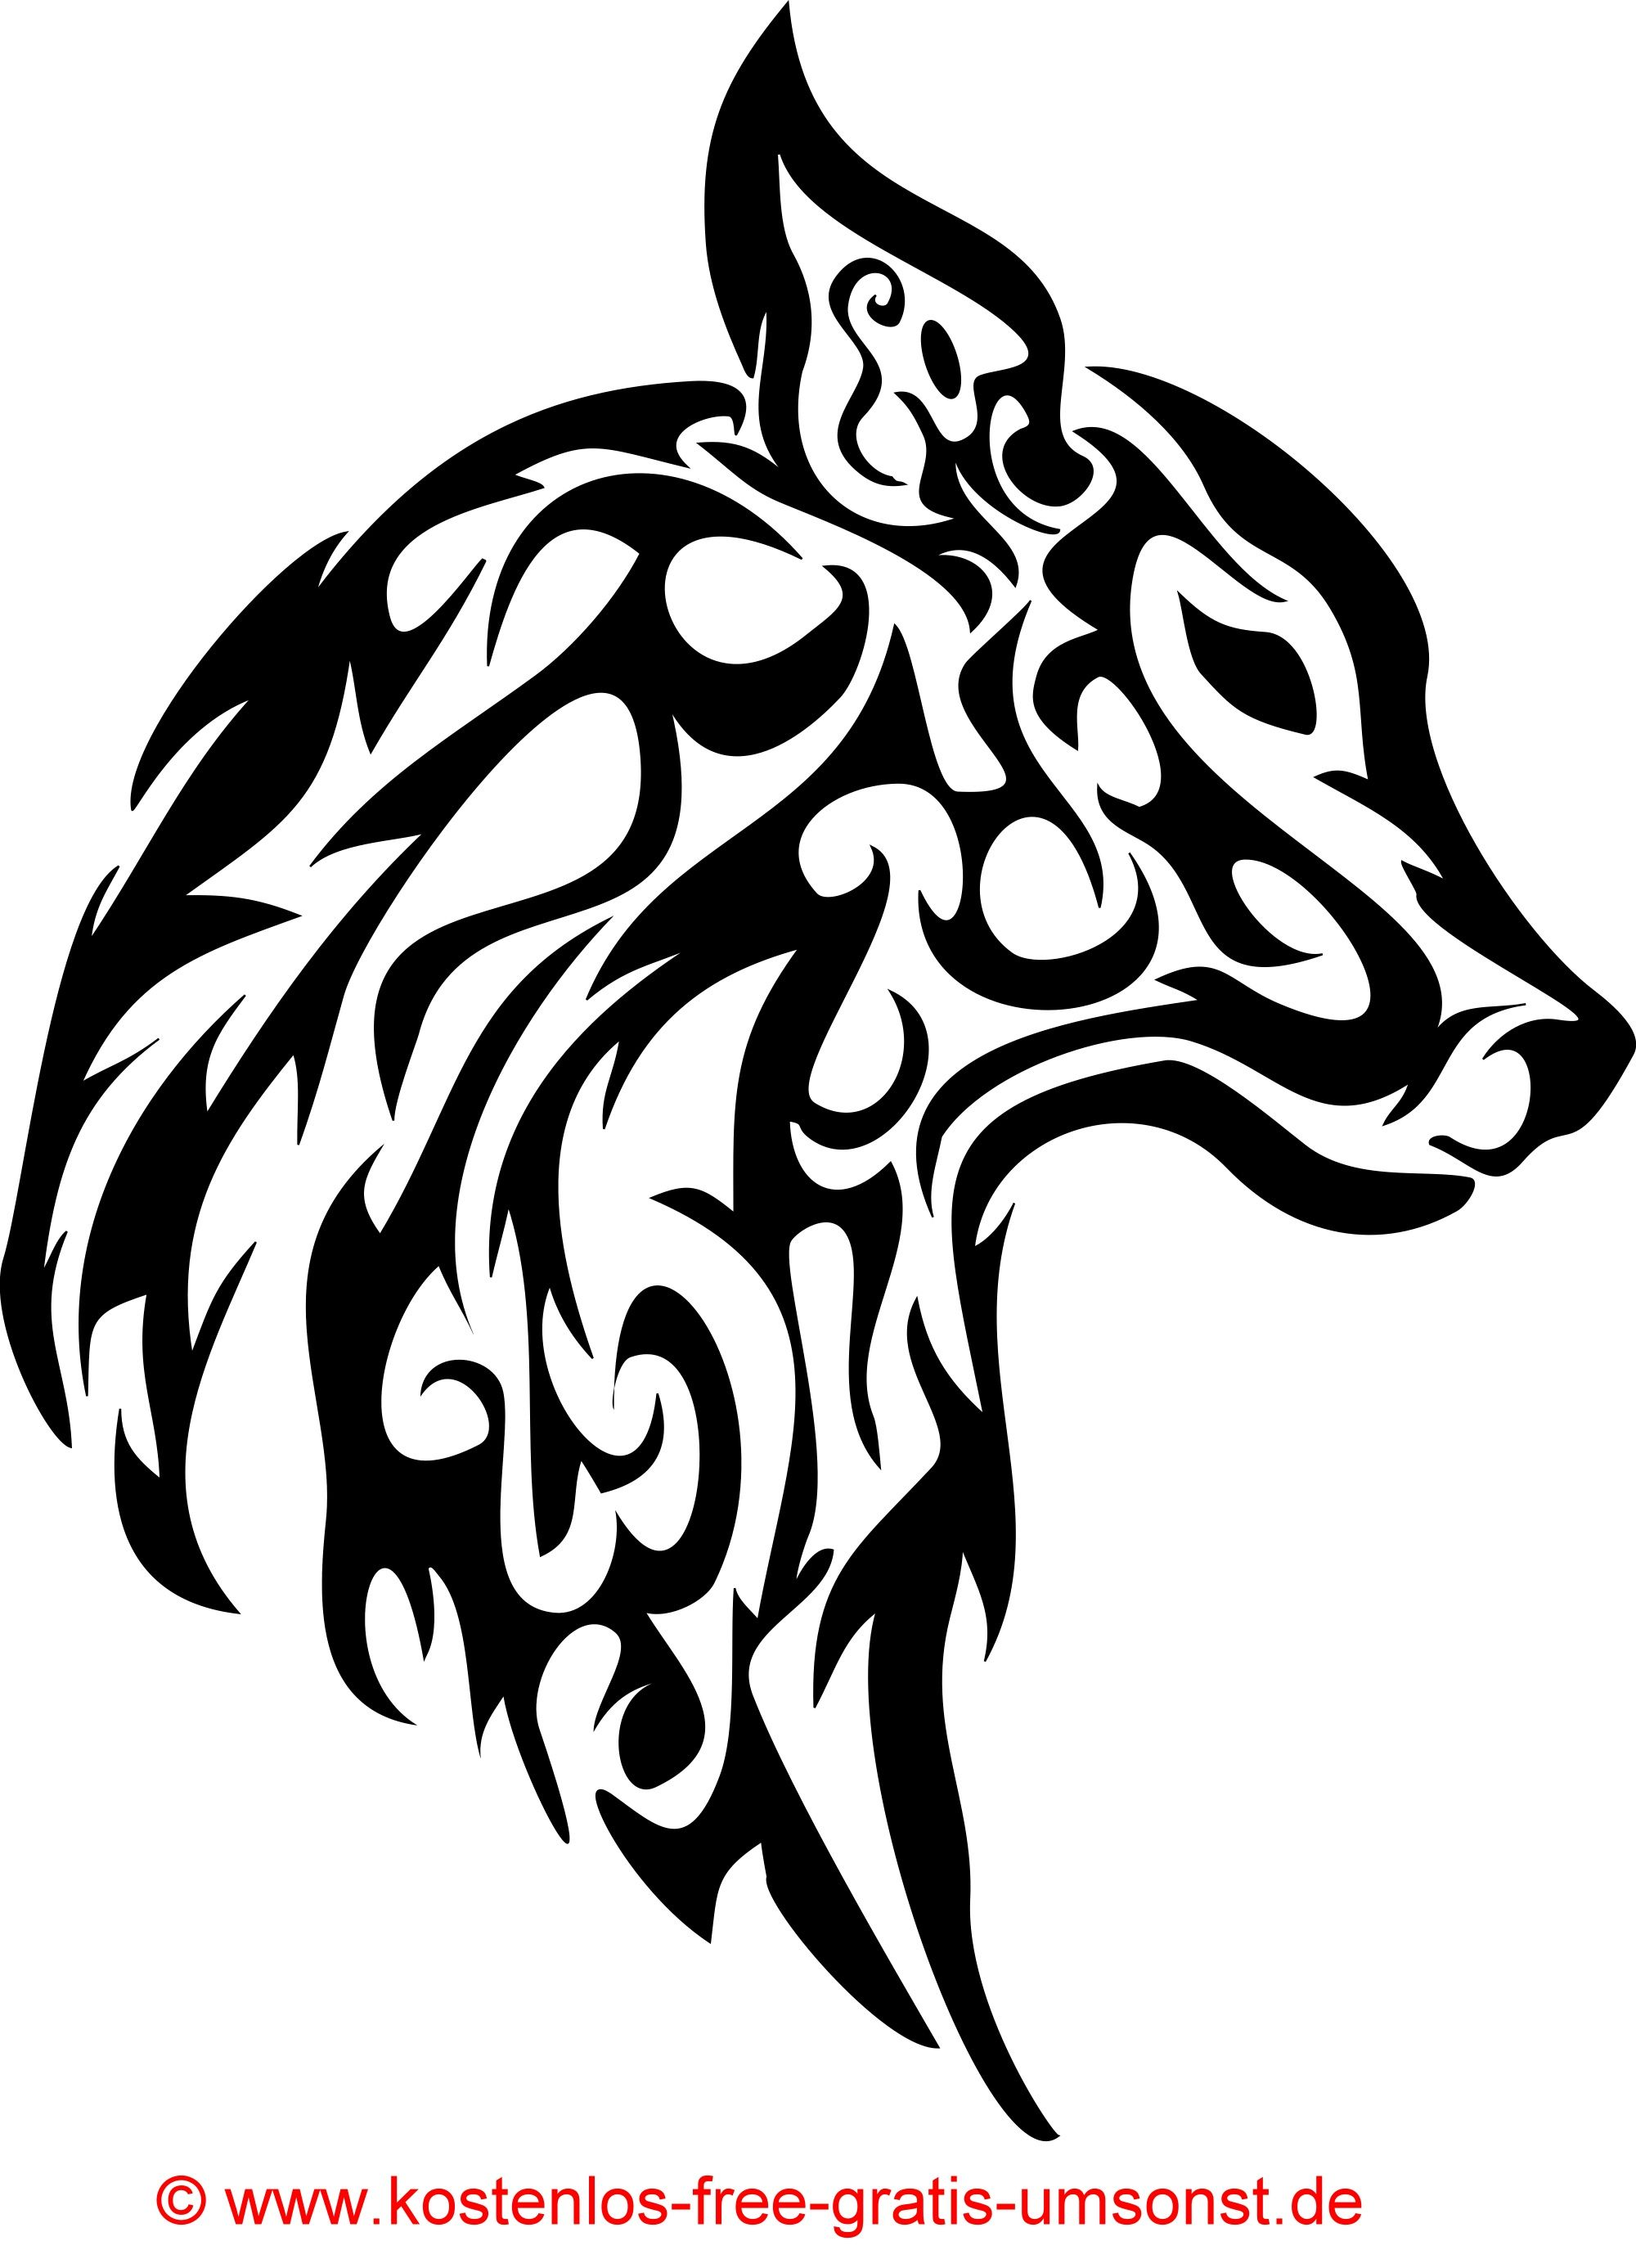 Tiere Tattoobild Hund Wolf Tattoomotive Tribal Art Black